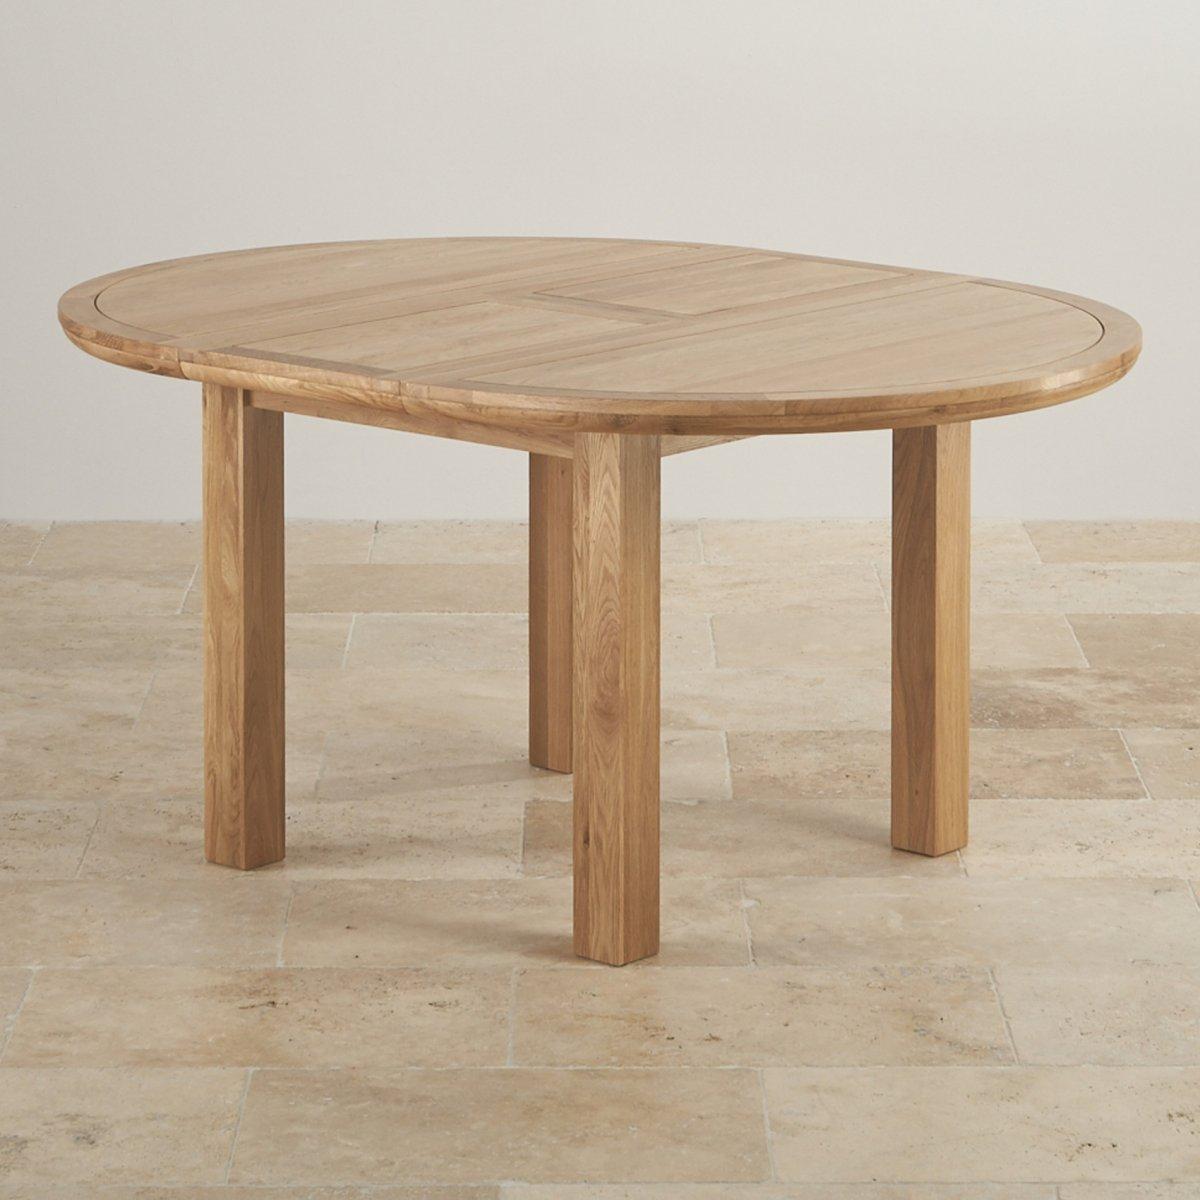 knightsbridge 4ft extending round dining table in natural oak. Black Bedroom Furniture Sets. Home Design Ideas